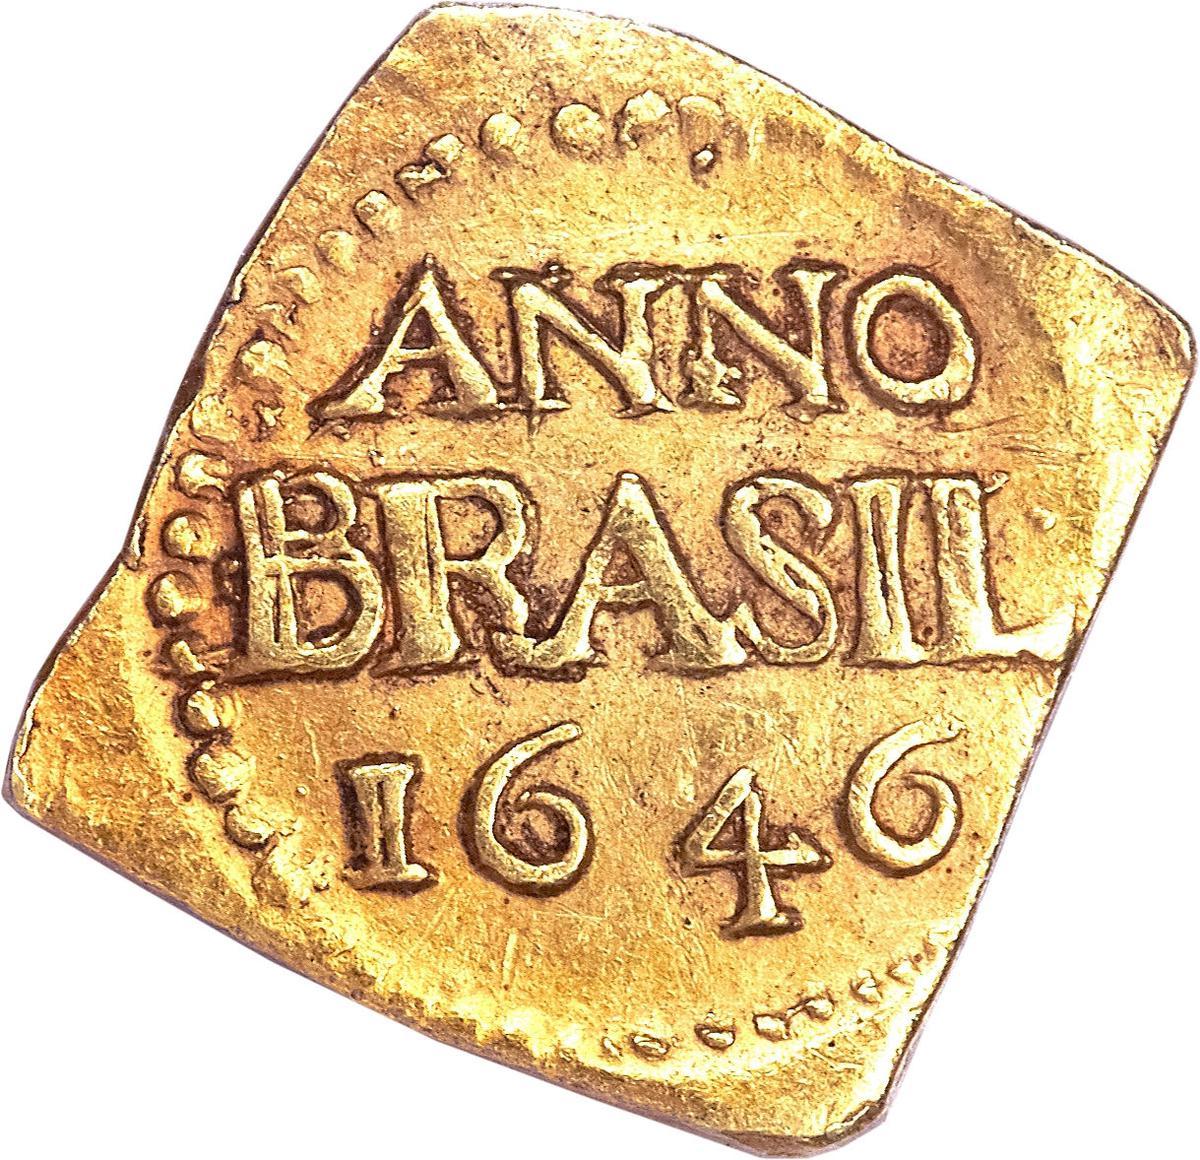 Coin 3 Florins (Geoctroyeerde Westindische Compagnie) New Holland reverse